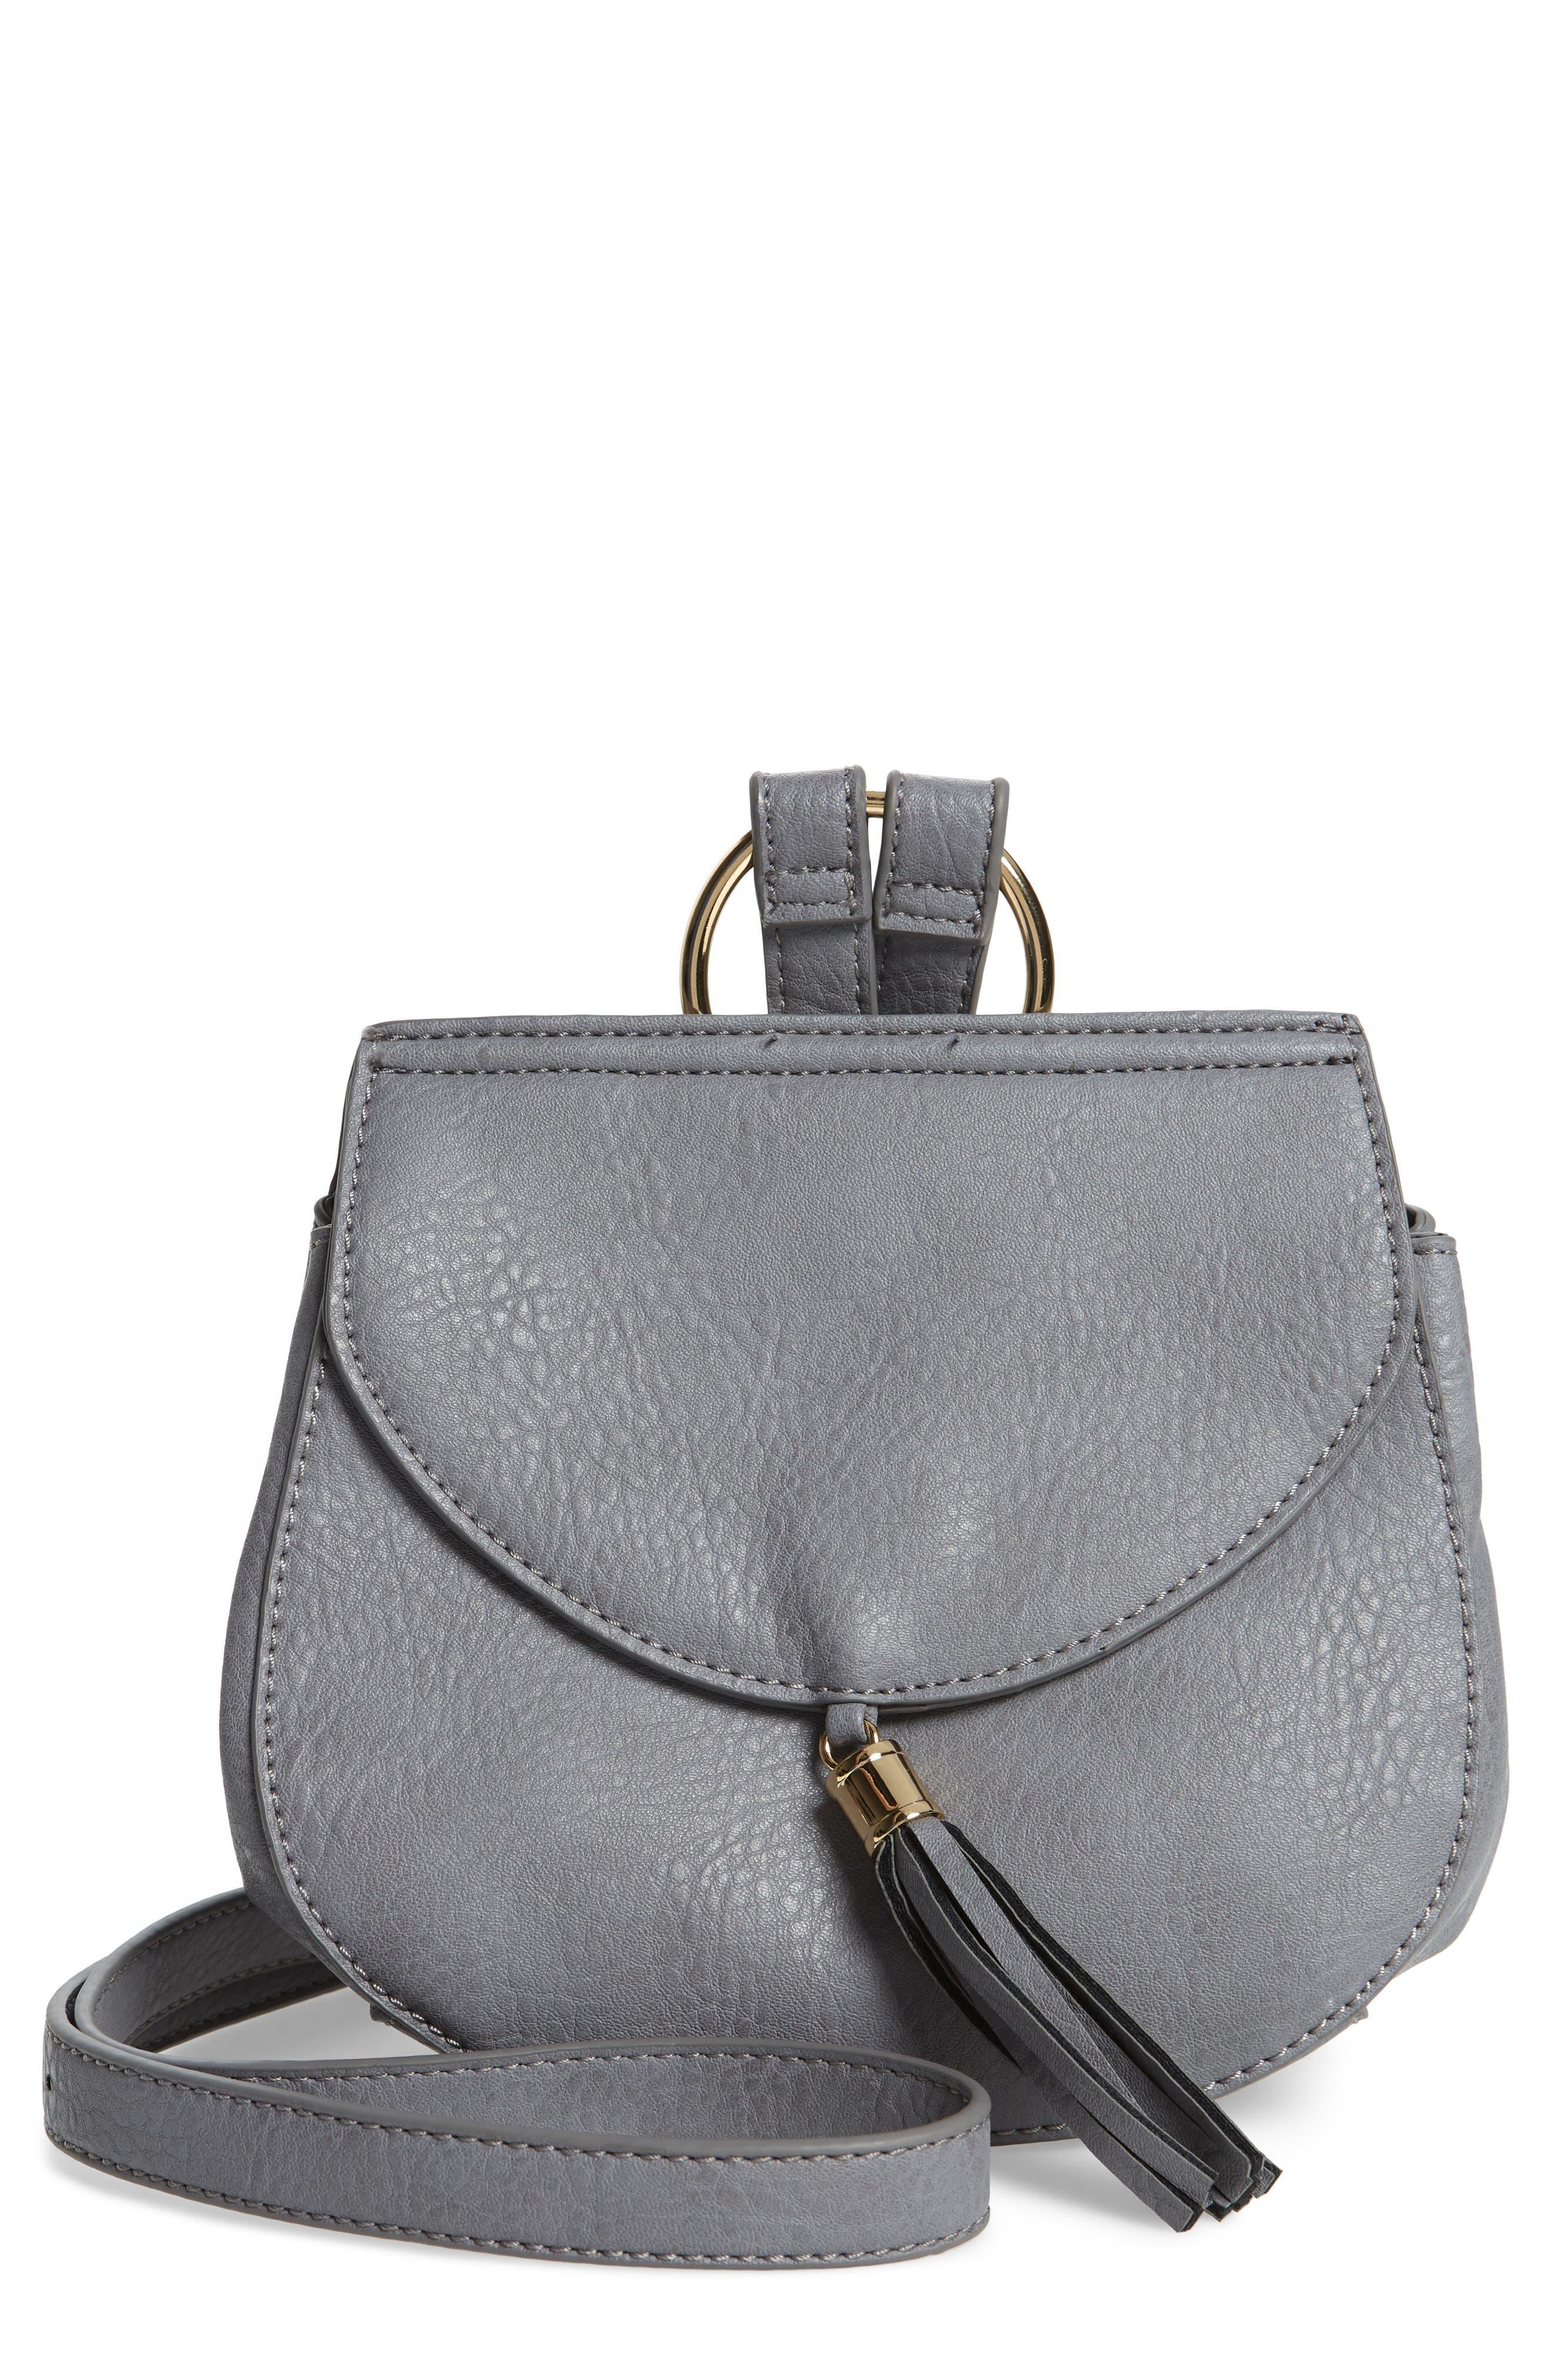 Tassel Faux Leather Crossbody Saddle Bag,                         Main,                         color,